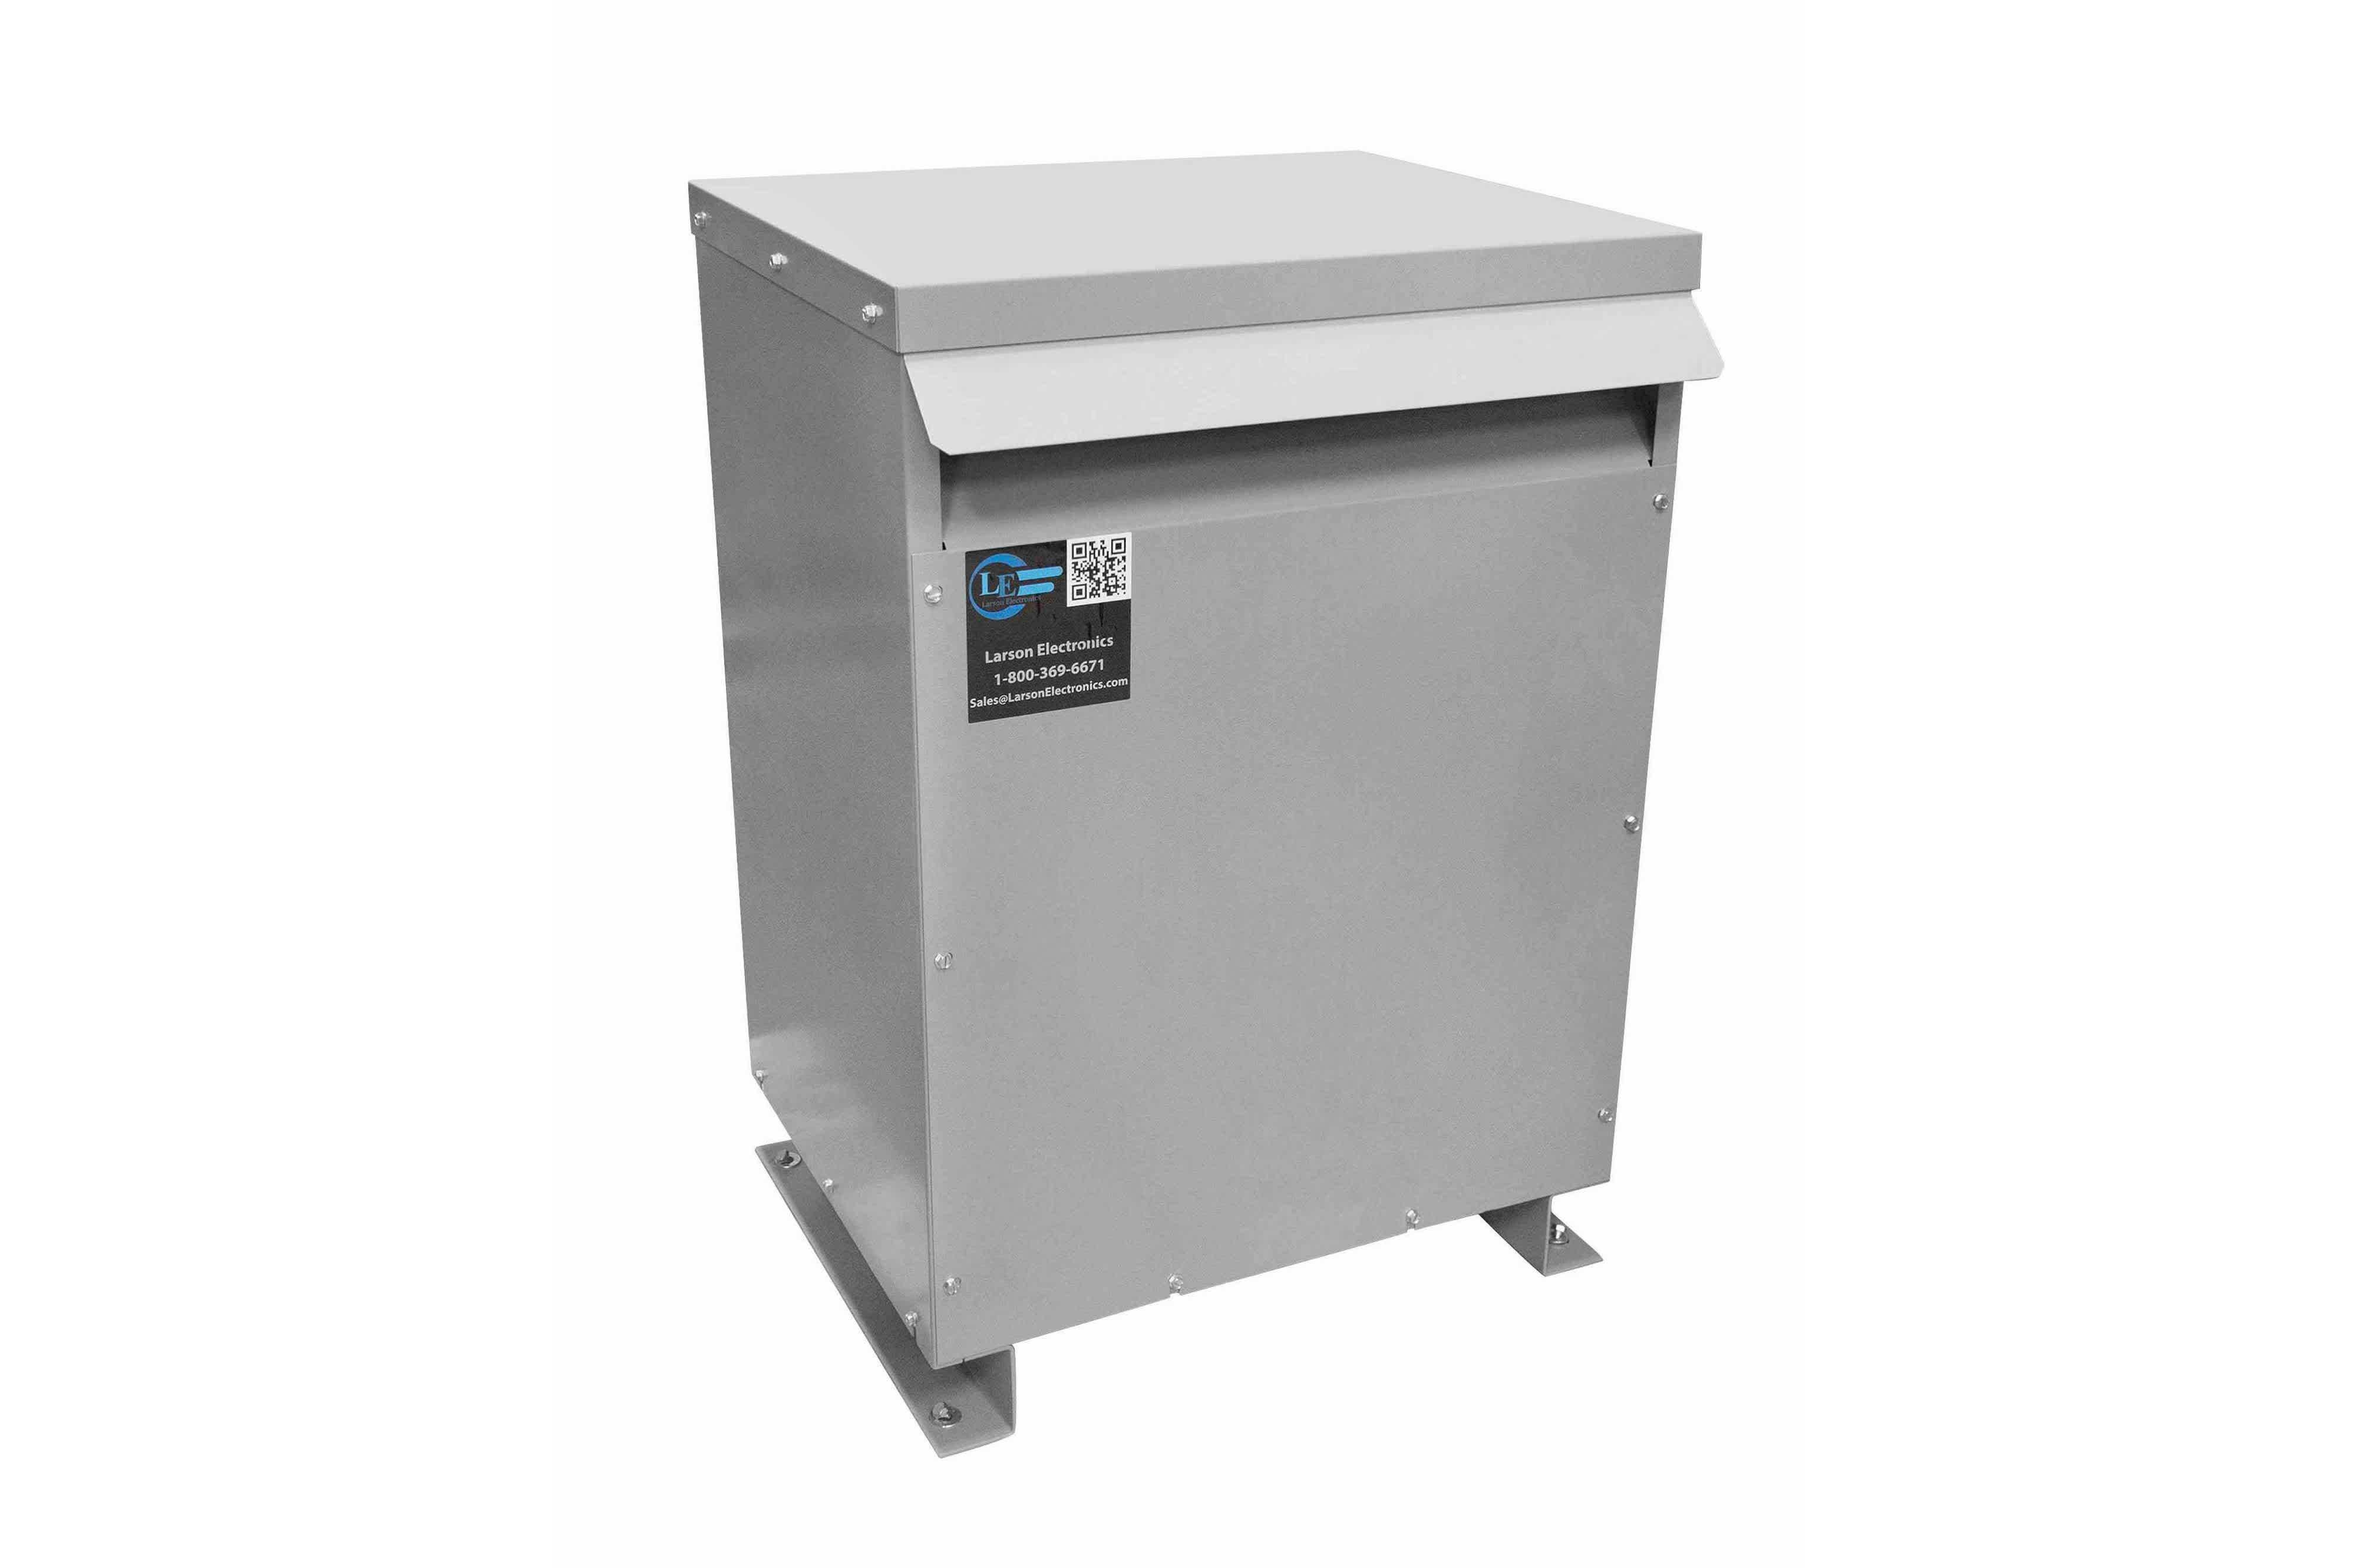 400 kVA 3PH Isolation Transformer, 400V Wye Primary, 208Y/120 Wye-N Secondary, N3R, Ventilated, 60 Hz